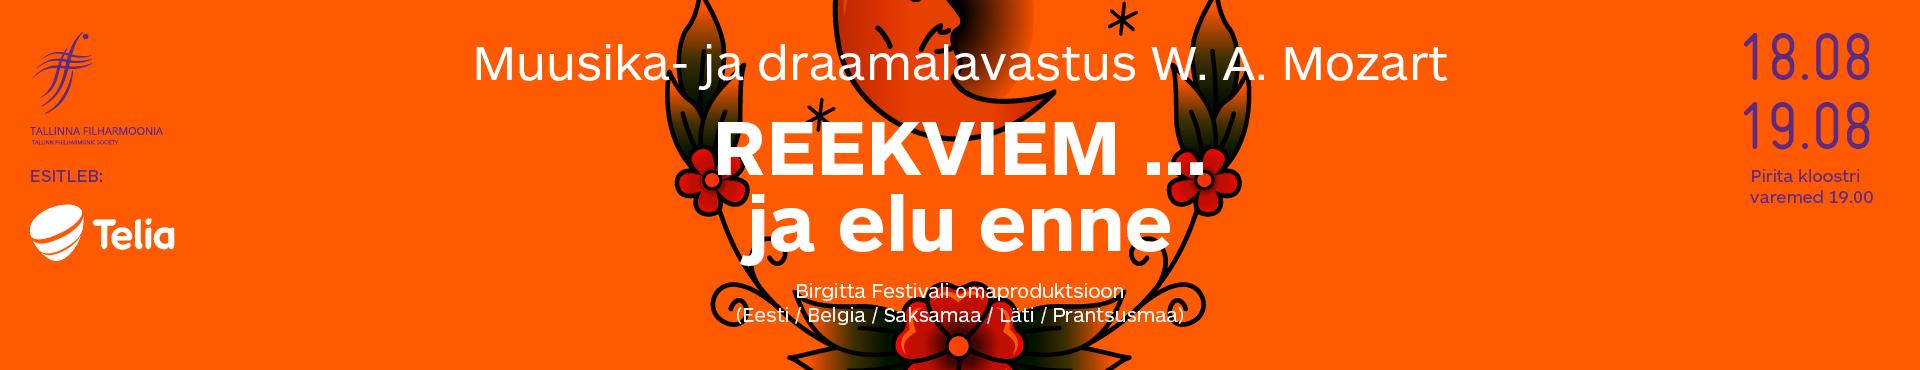 Birgitta Festival (4)